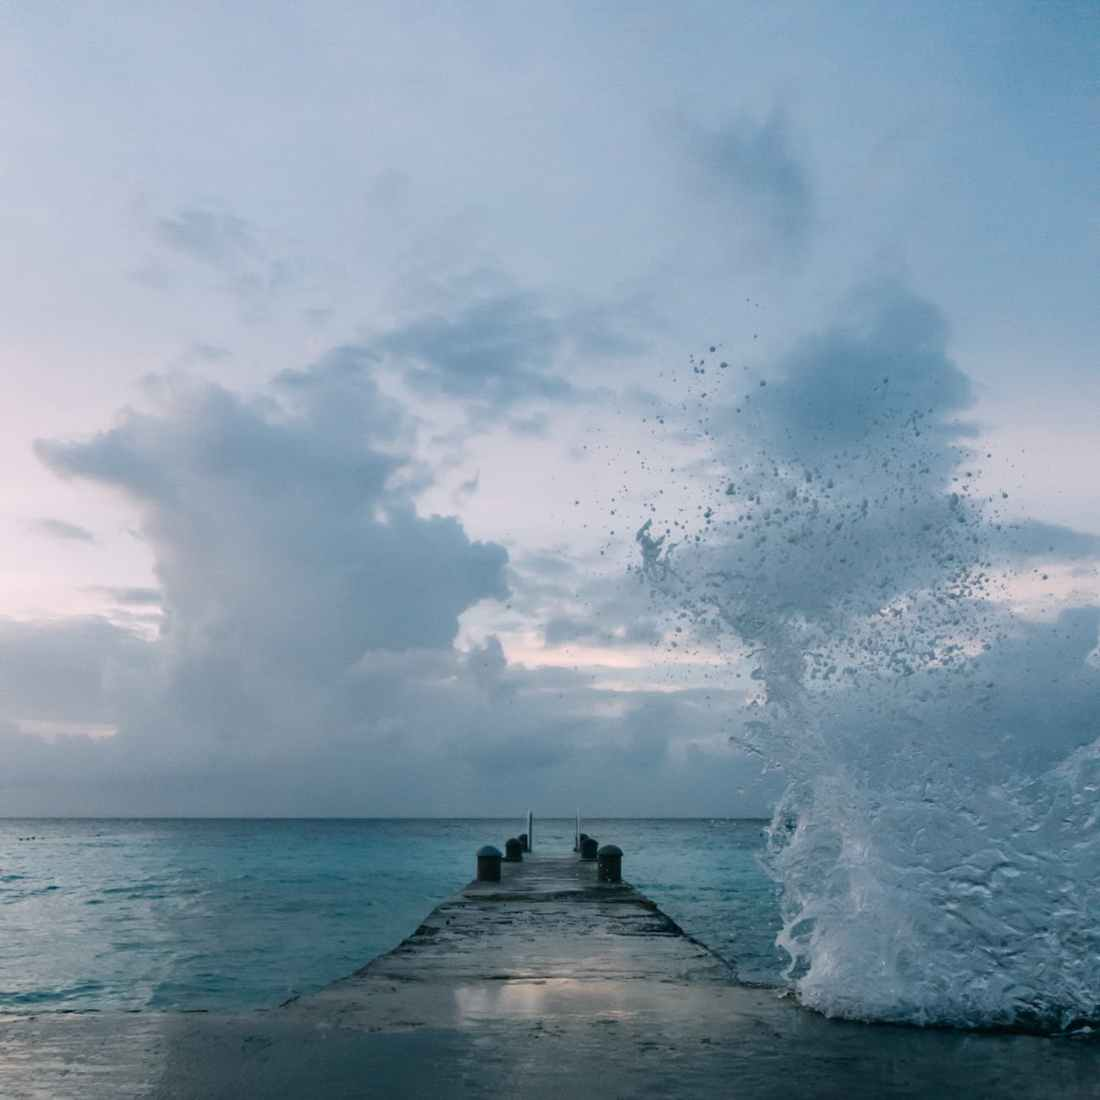 ocean wave splashing on dock